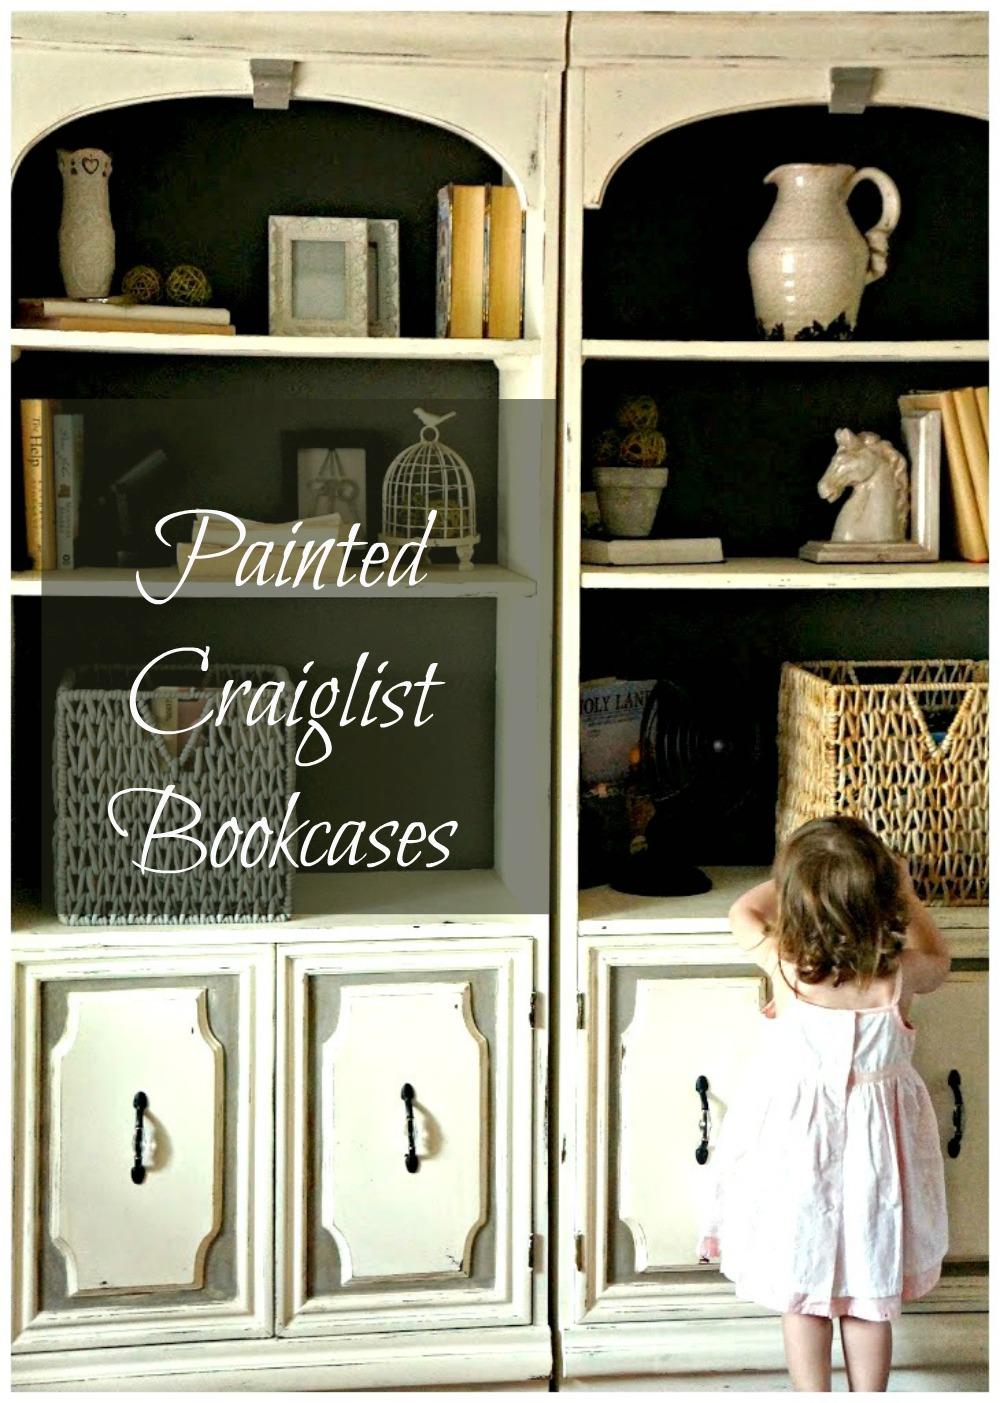 painted-craiglist-bookcases